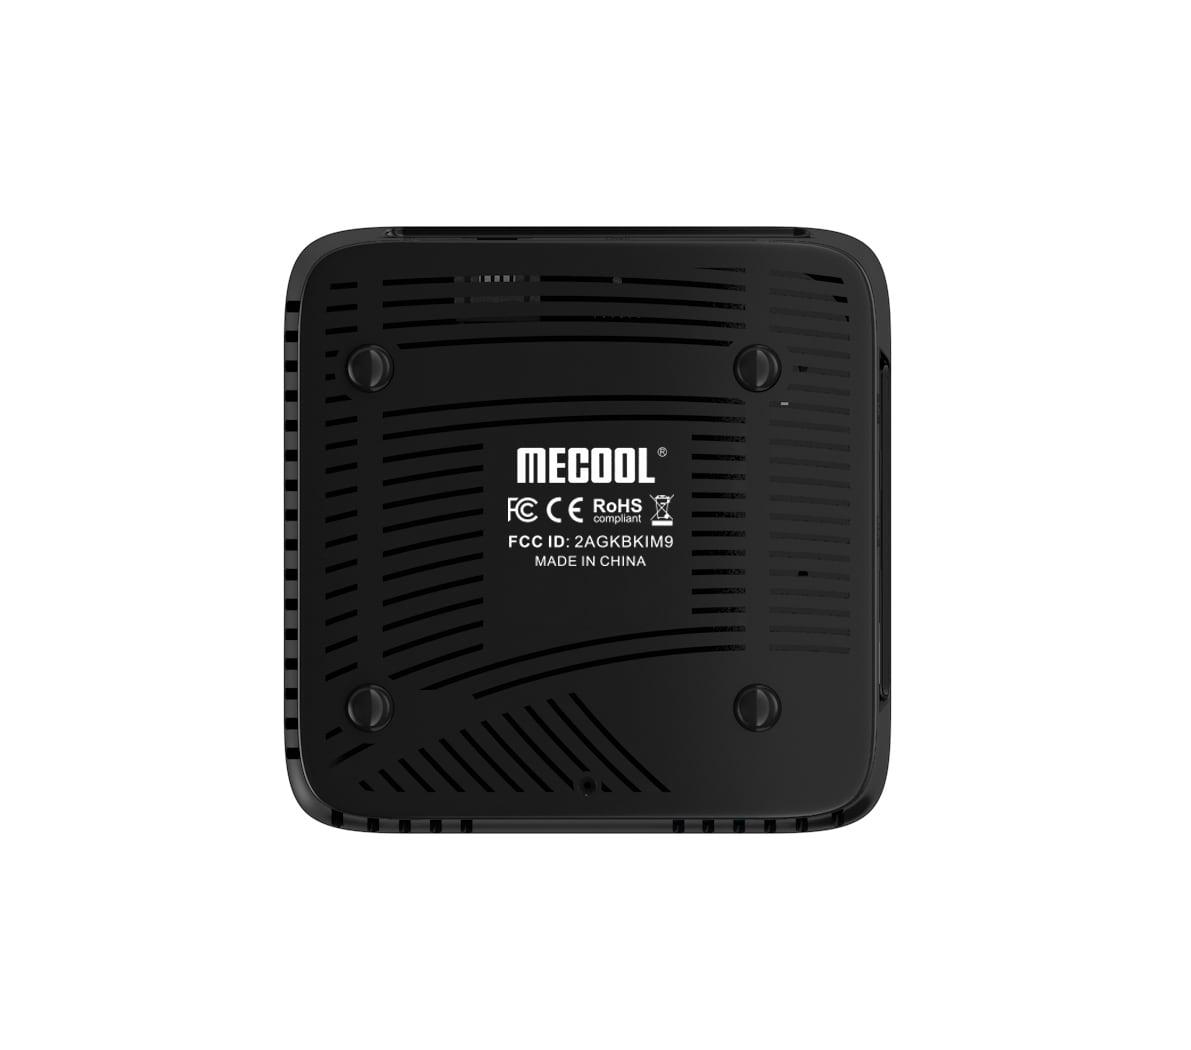 Mecool M8S PRO W TV Box - 2.4G, 2GB RAM, 16GB ROM, Android, MAG625X 4K VP9 - Ordinary RC,AU Plug - 3